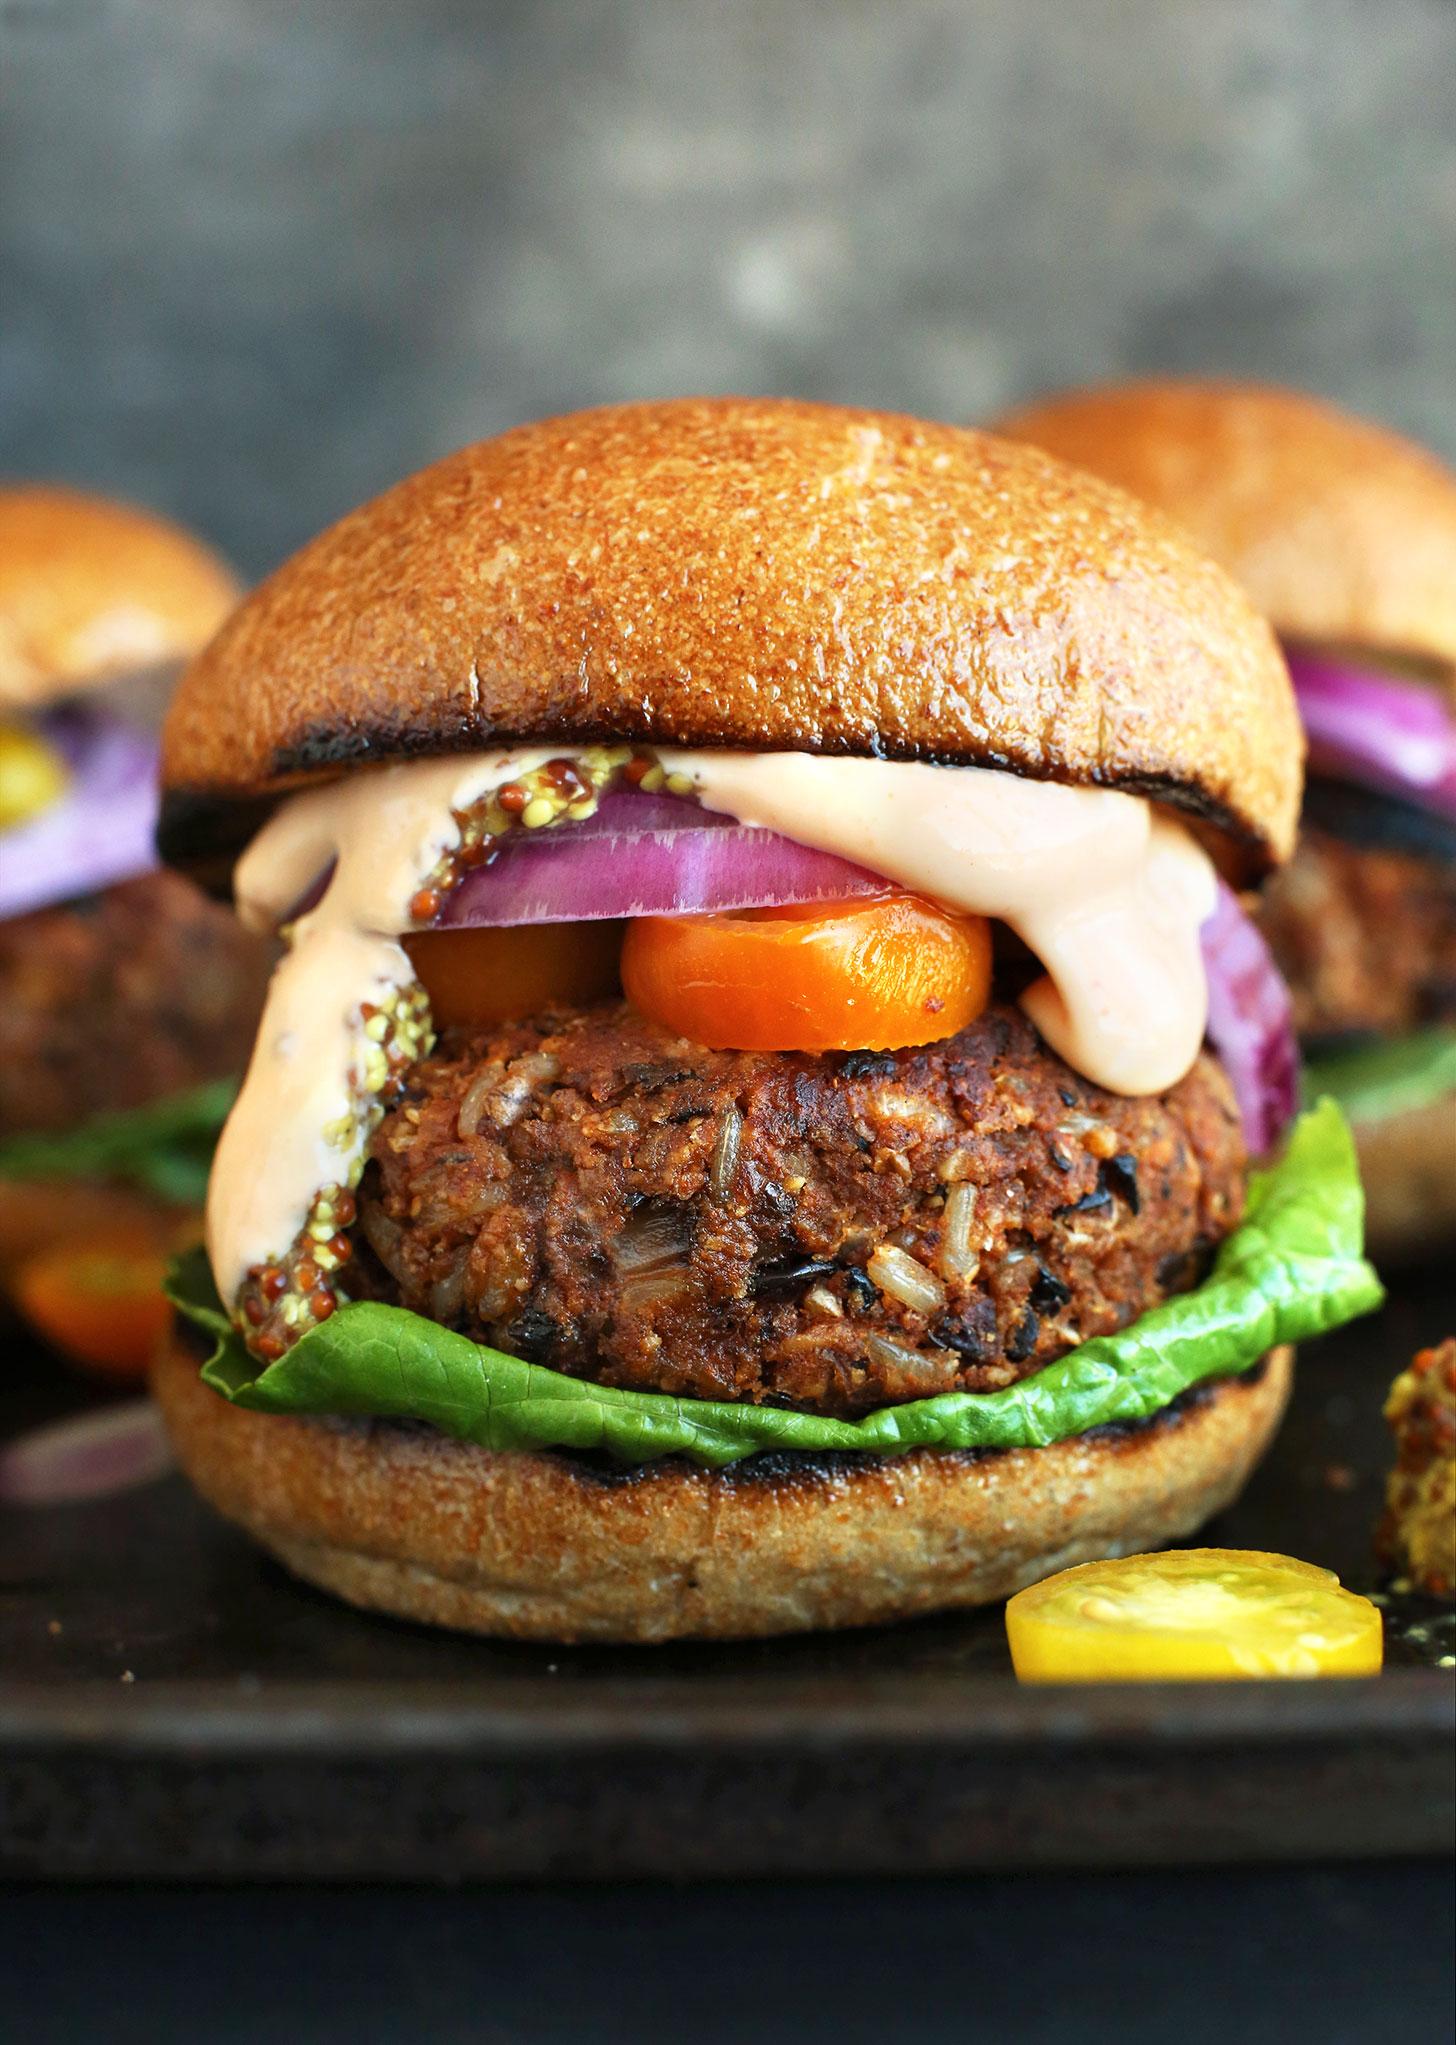 Grillable Veggie Burgers